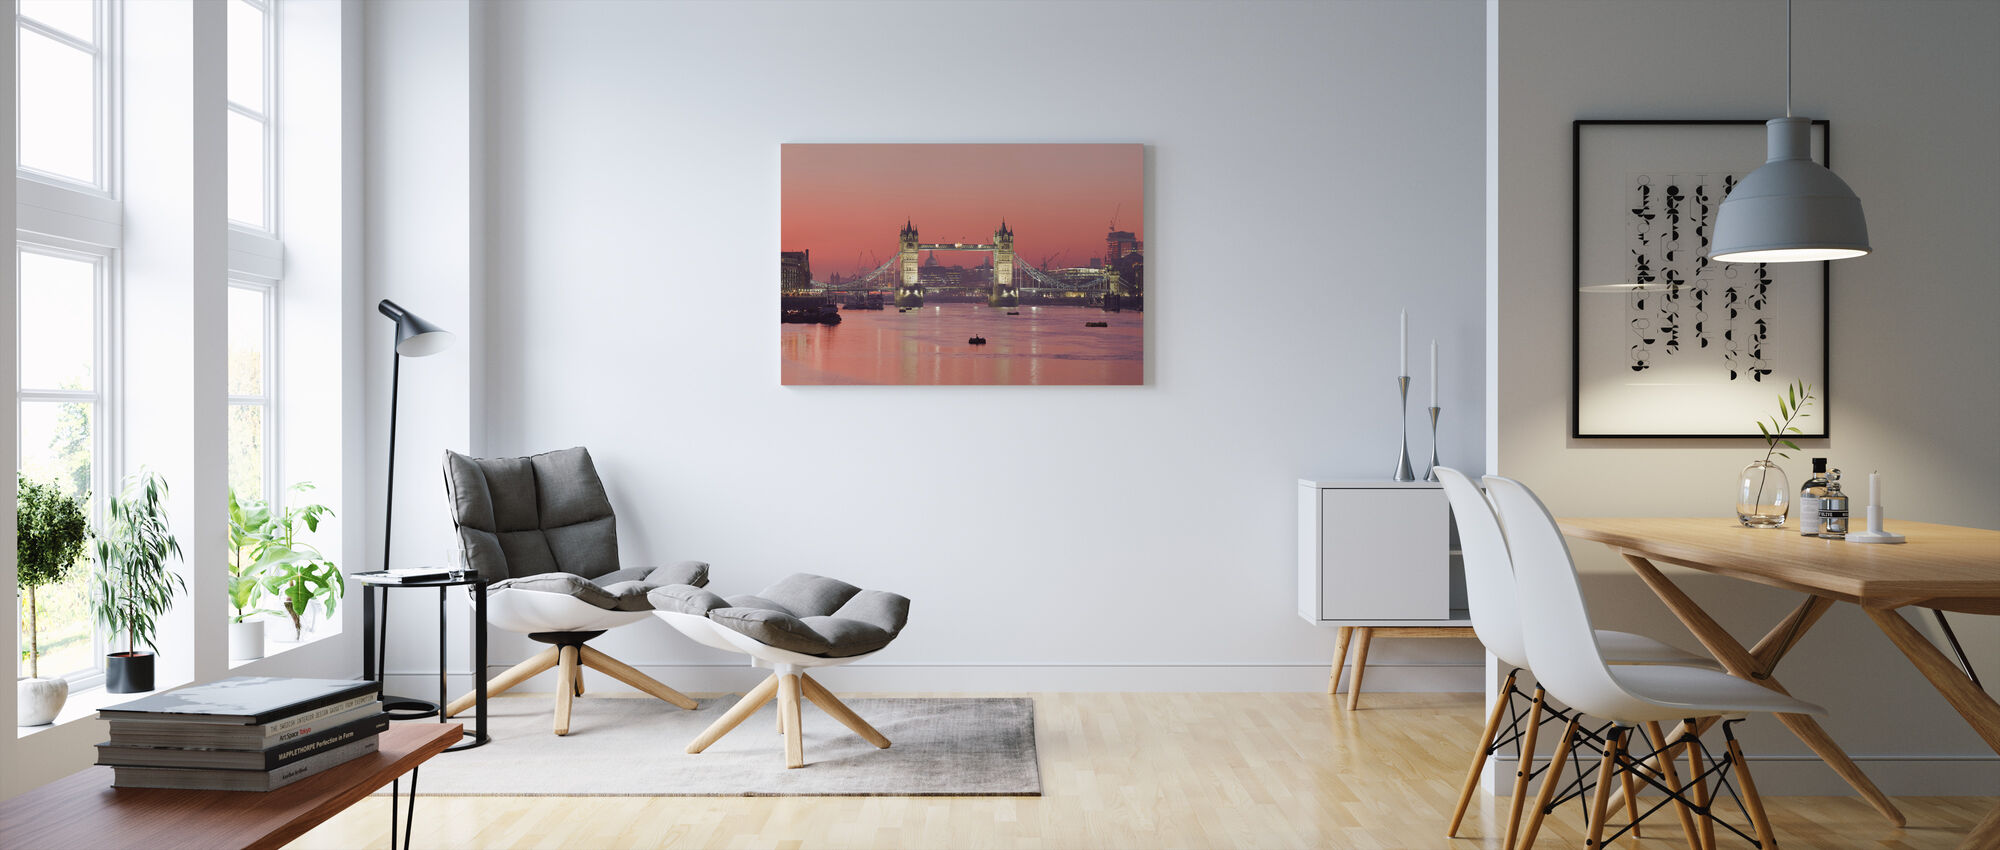 London Skyline i Sunset - Canvastavla - Vardagsrum